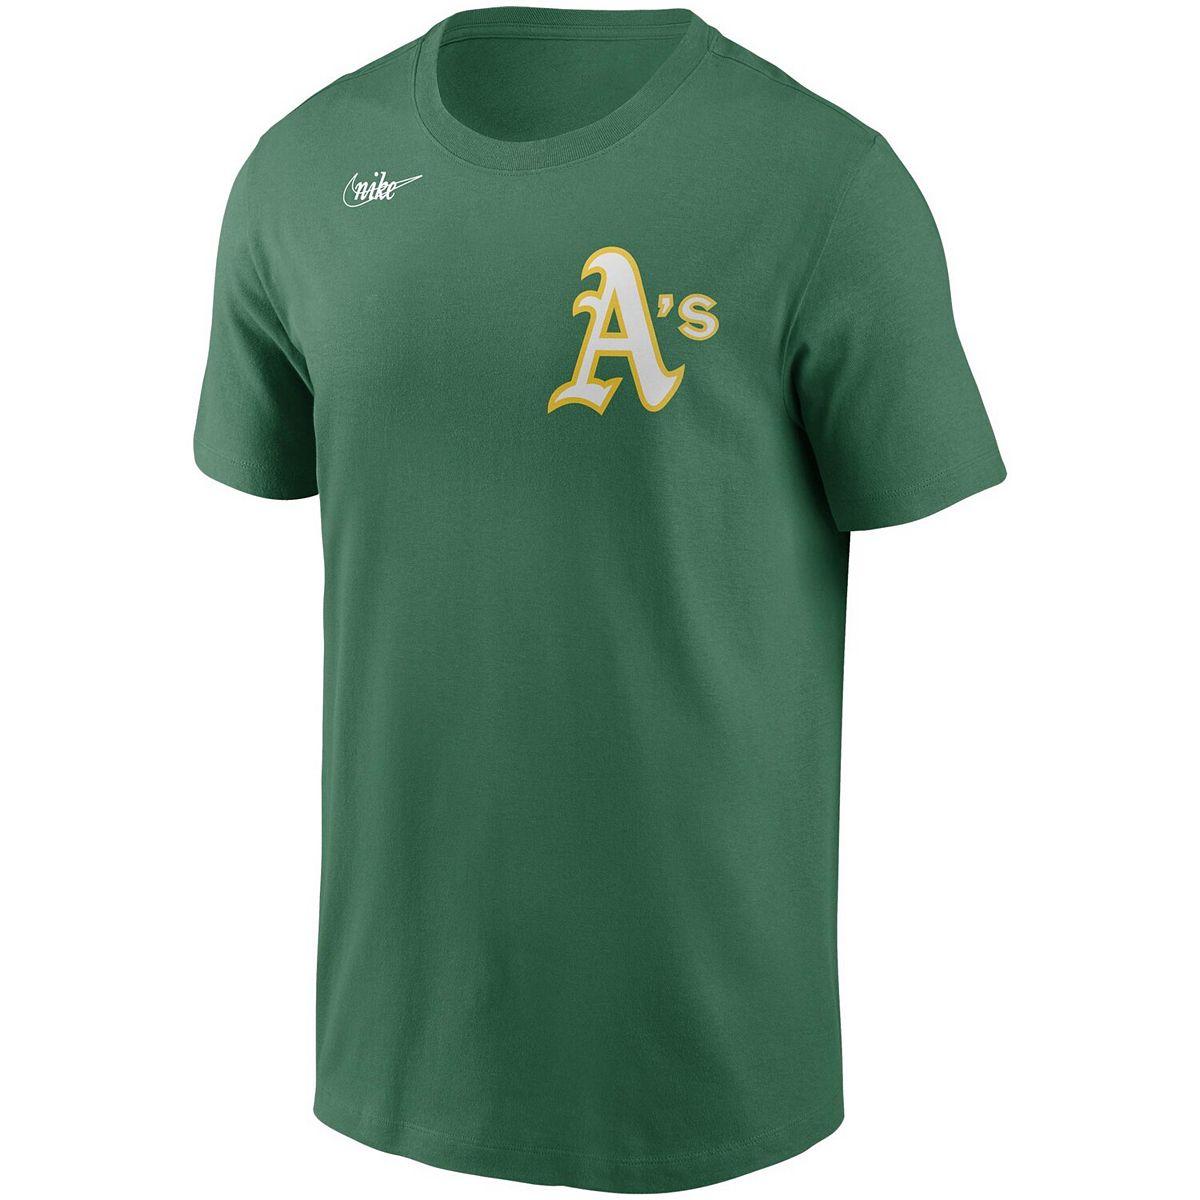 Men's Nike Reggie Jackson Green Oakland Athletics Cooperstown Collection Name & Number T-Shirt w4JKs